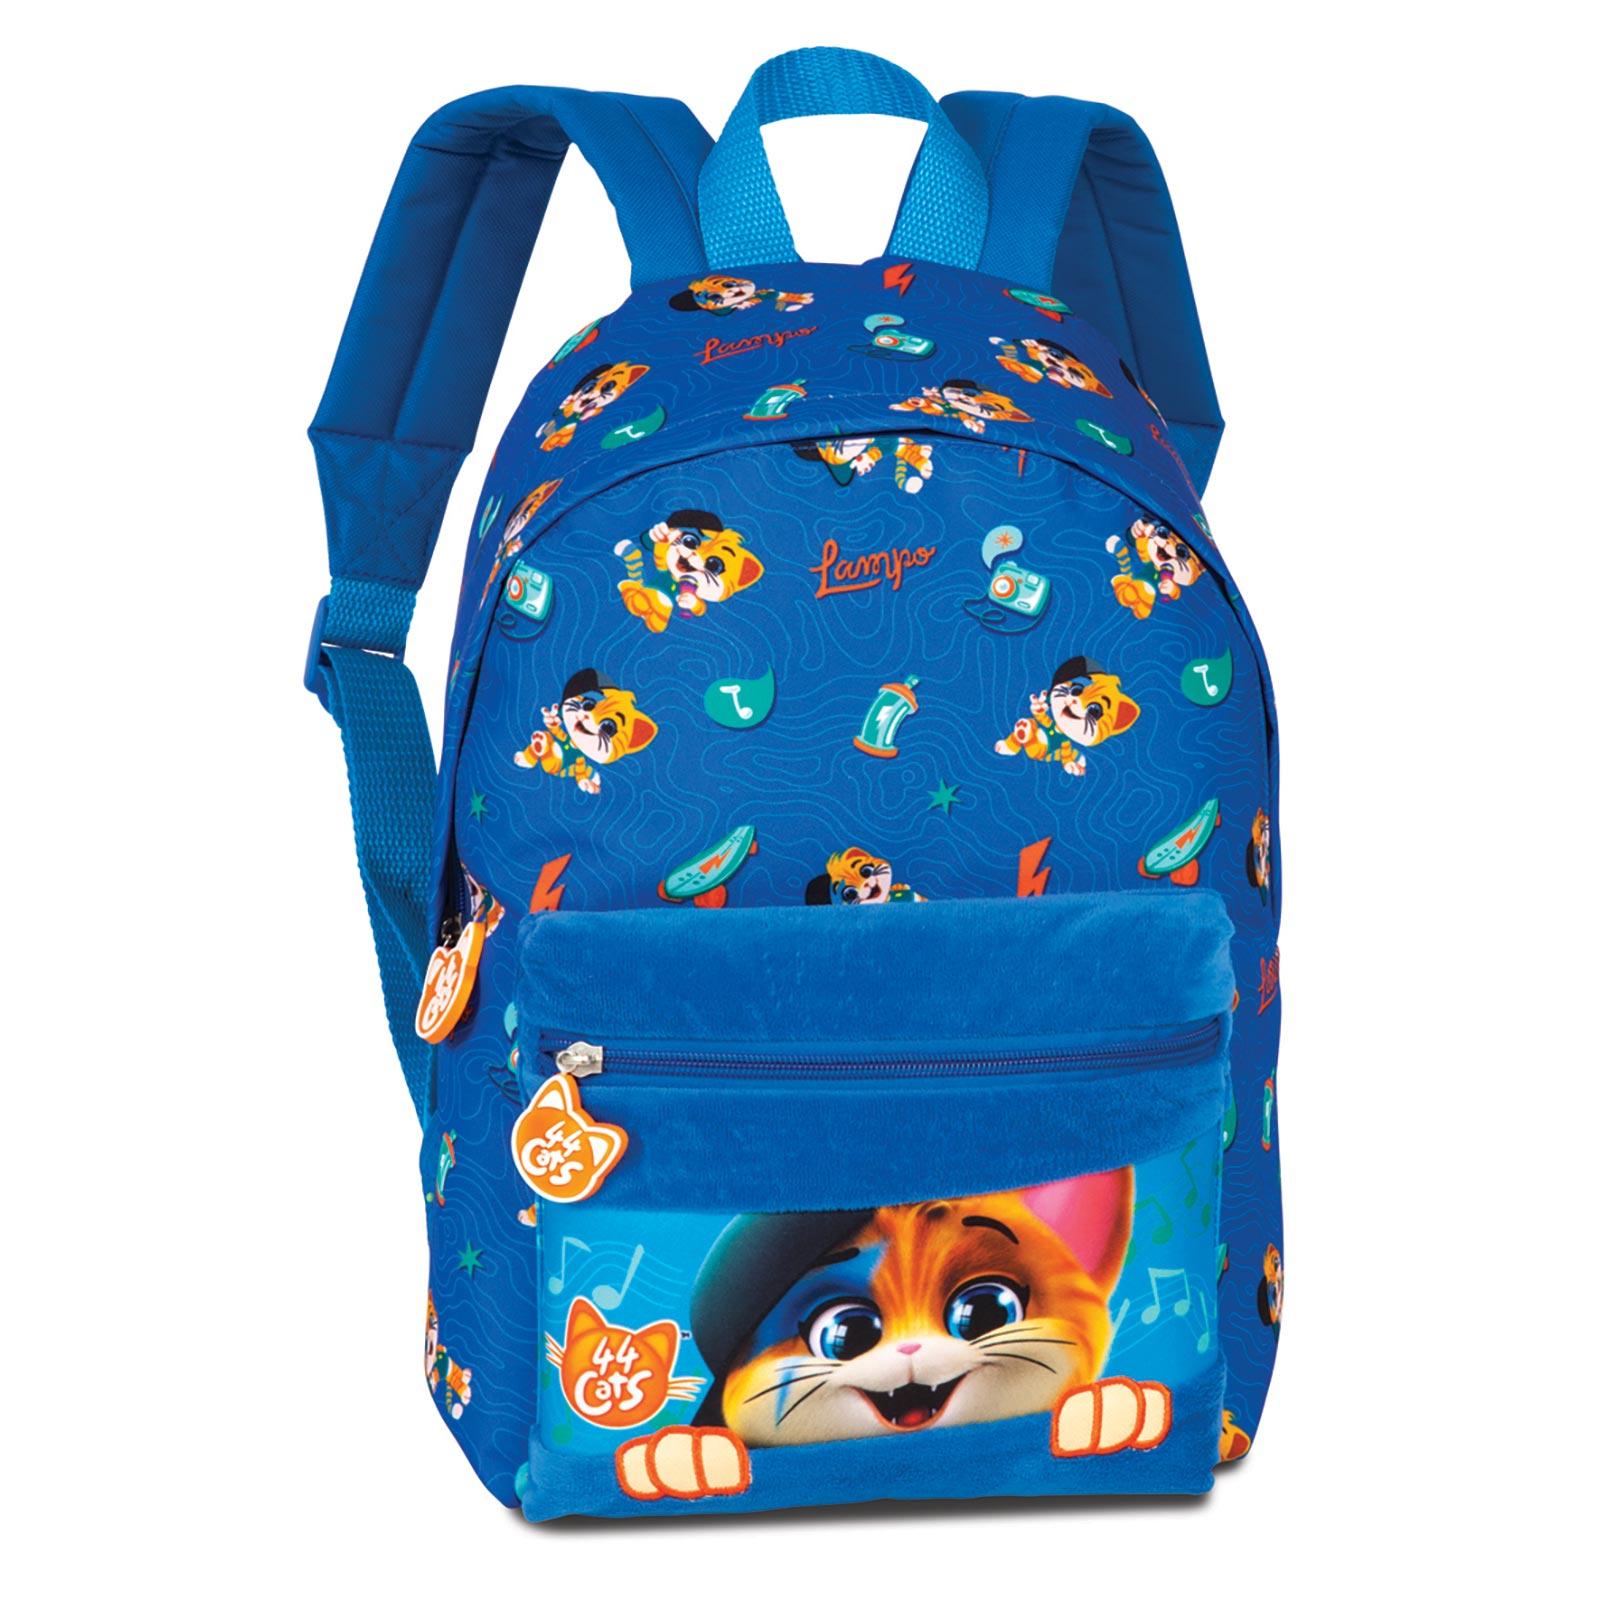 Fabrizio Kids 44 Cats Rucksack 36 cm - Blau 20629-0600